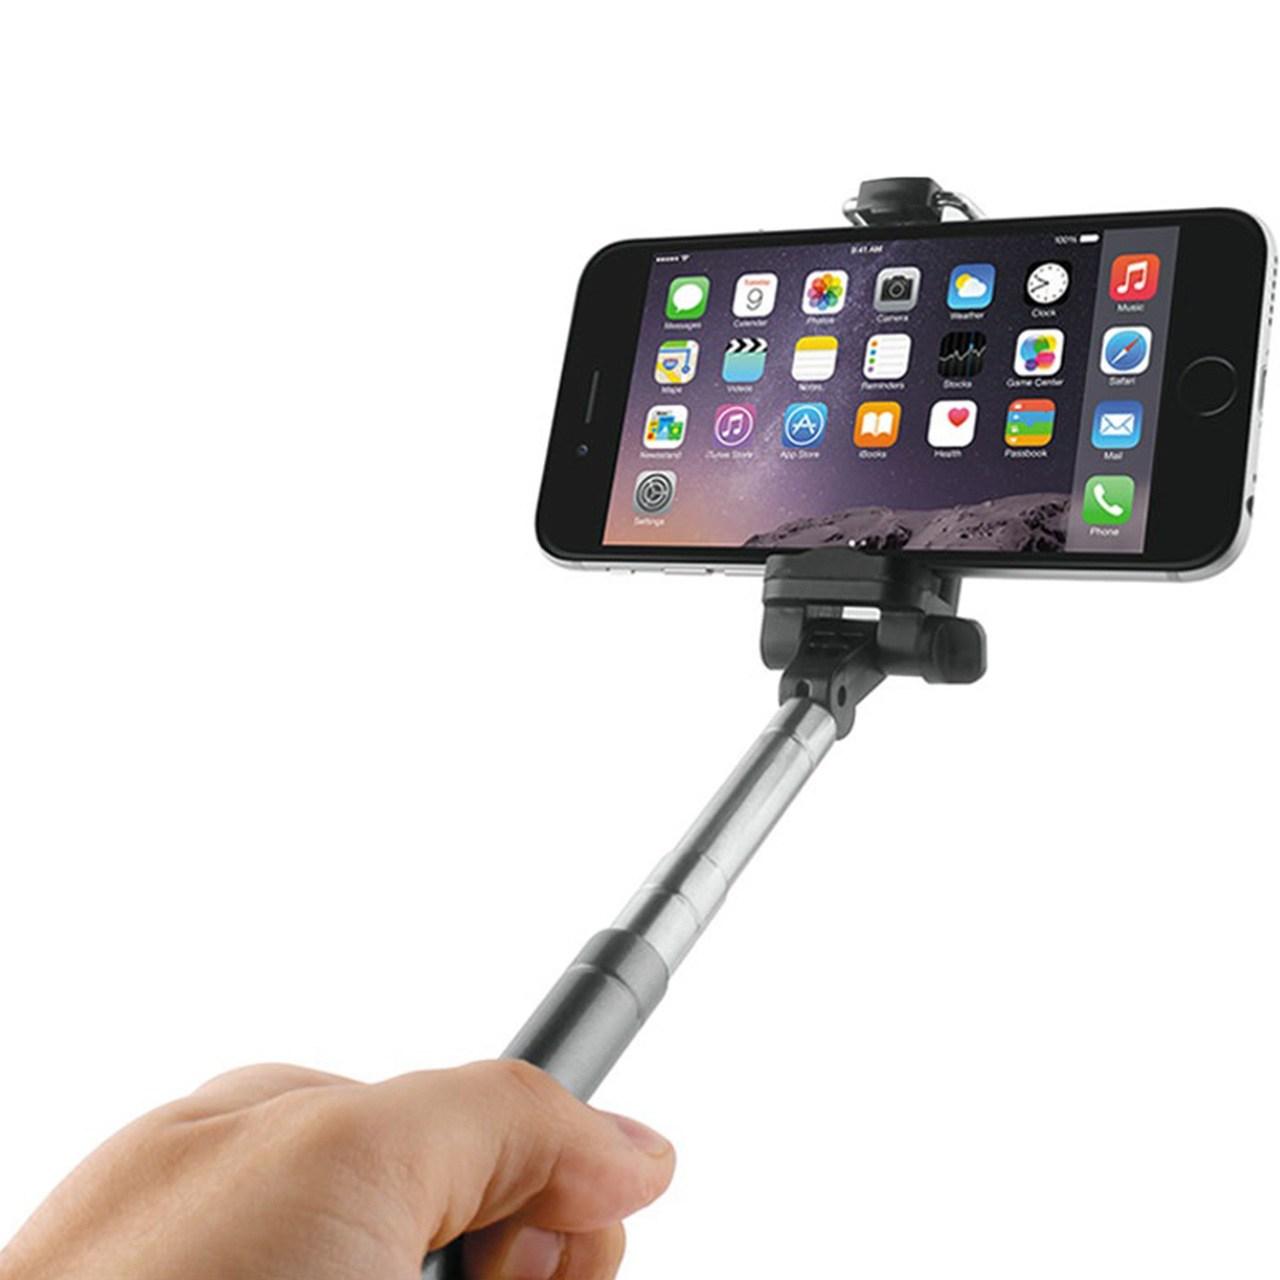 پایه مونونپاد اسمارت لاین مدل Pocket Selfie Stick SLSELFIEMONOPOD1